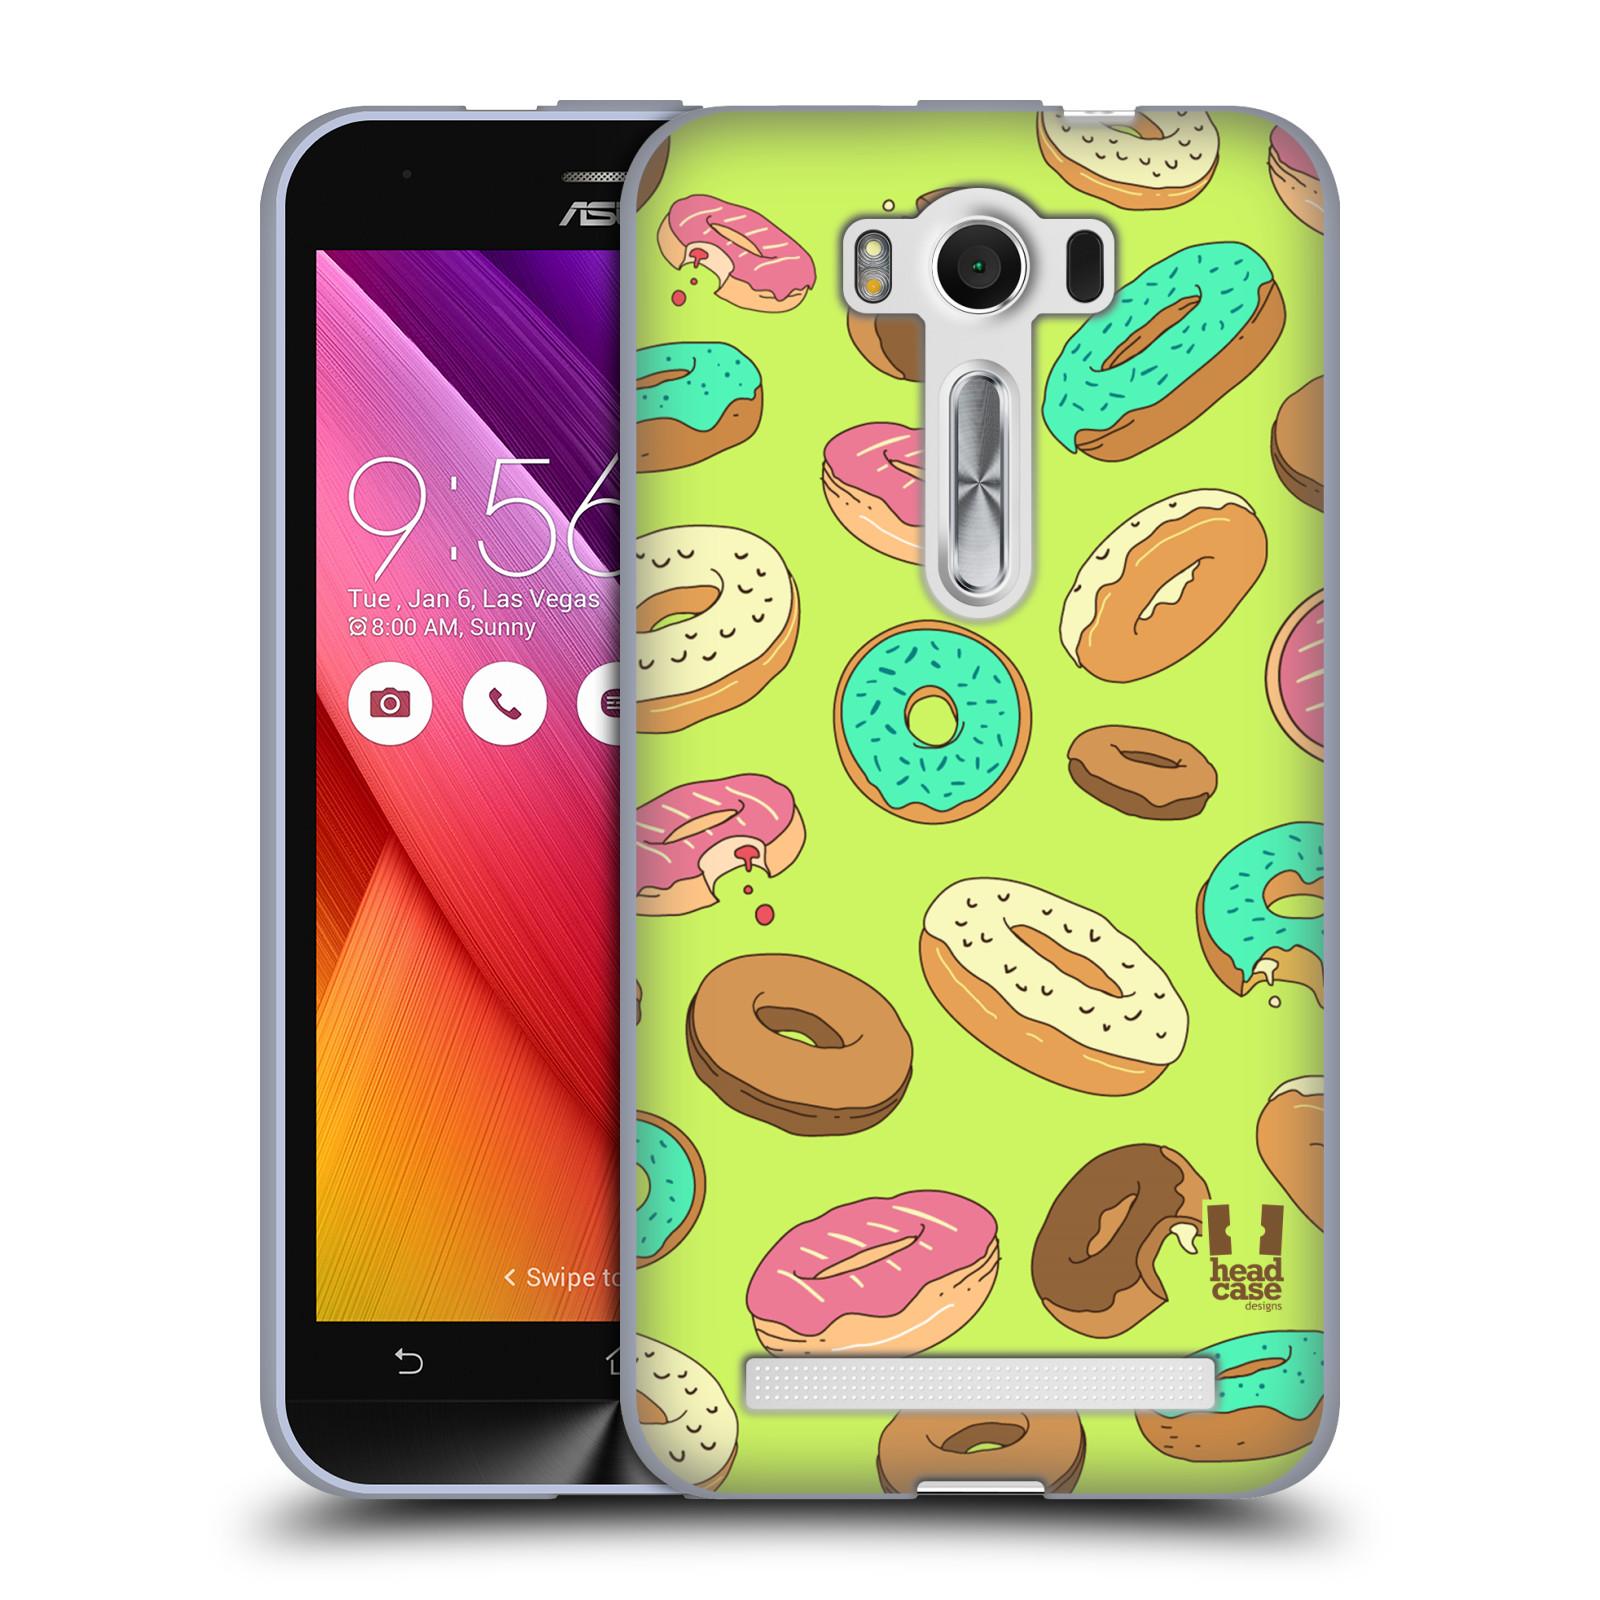 "Silikonové pouzdro na mobil Asus ZenFone 2 Laser ZE500KL HEAD CASE DONUTKY (Silikonový kryt či obal na mobilní telefon Asus ZenFone 2 Laser ZE500KL s 5"" displejem)"